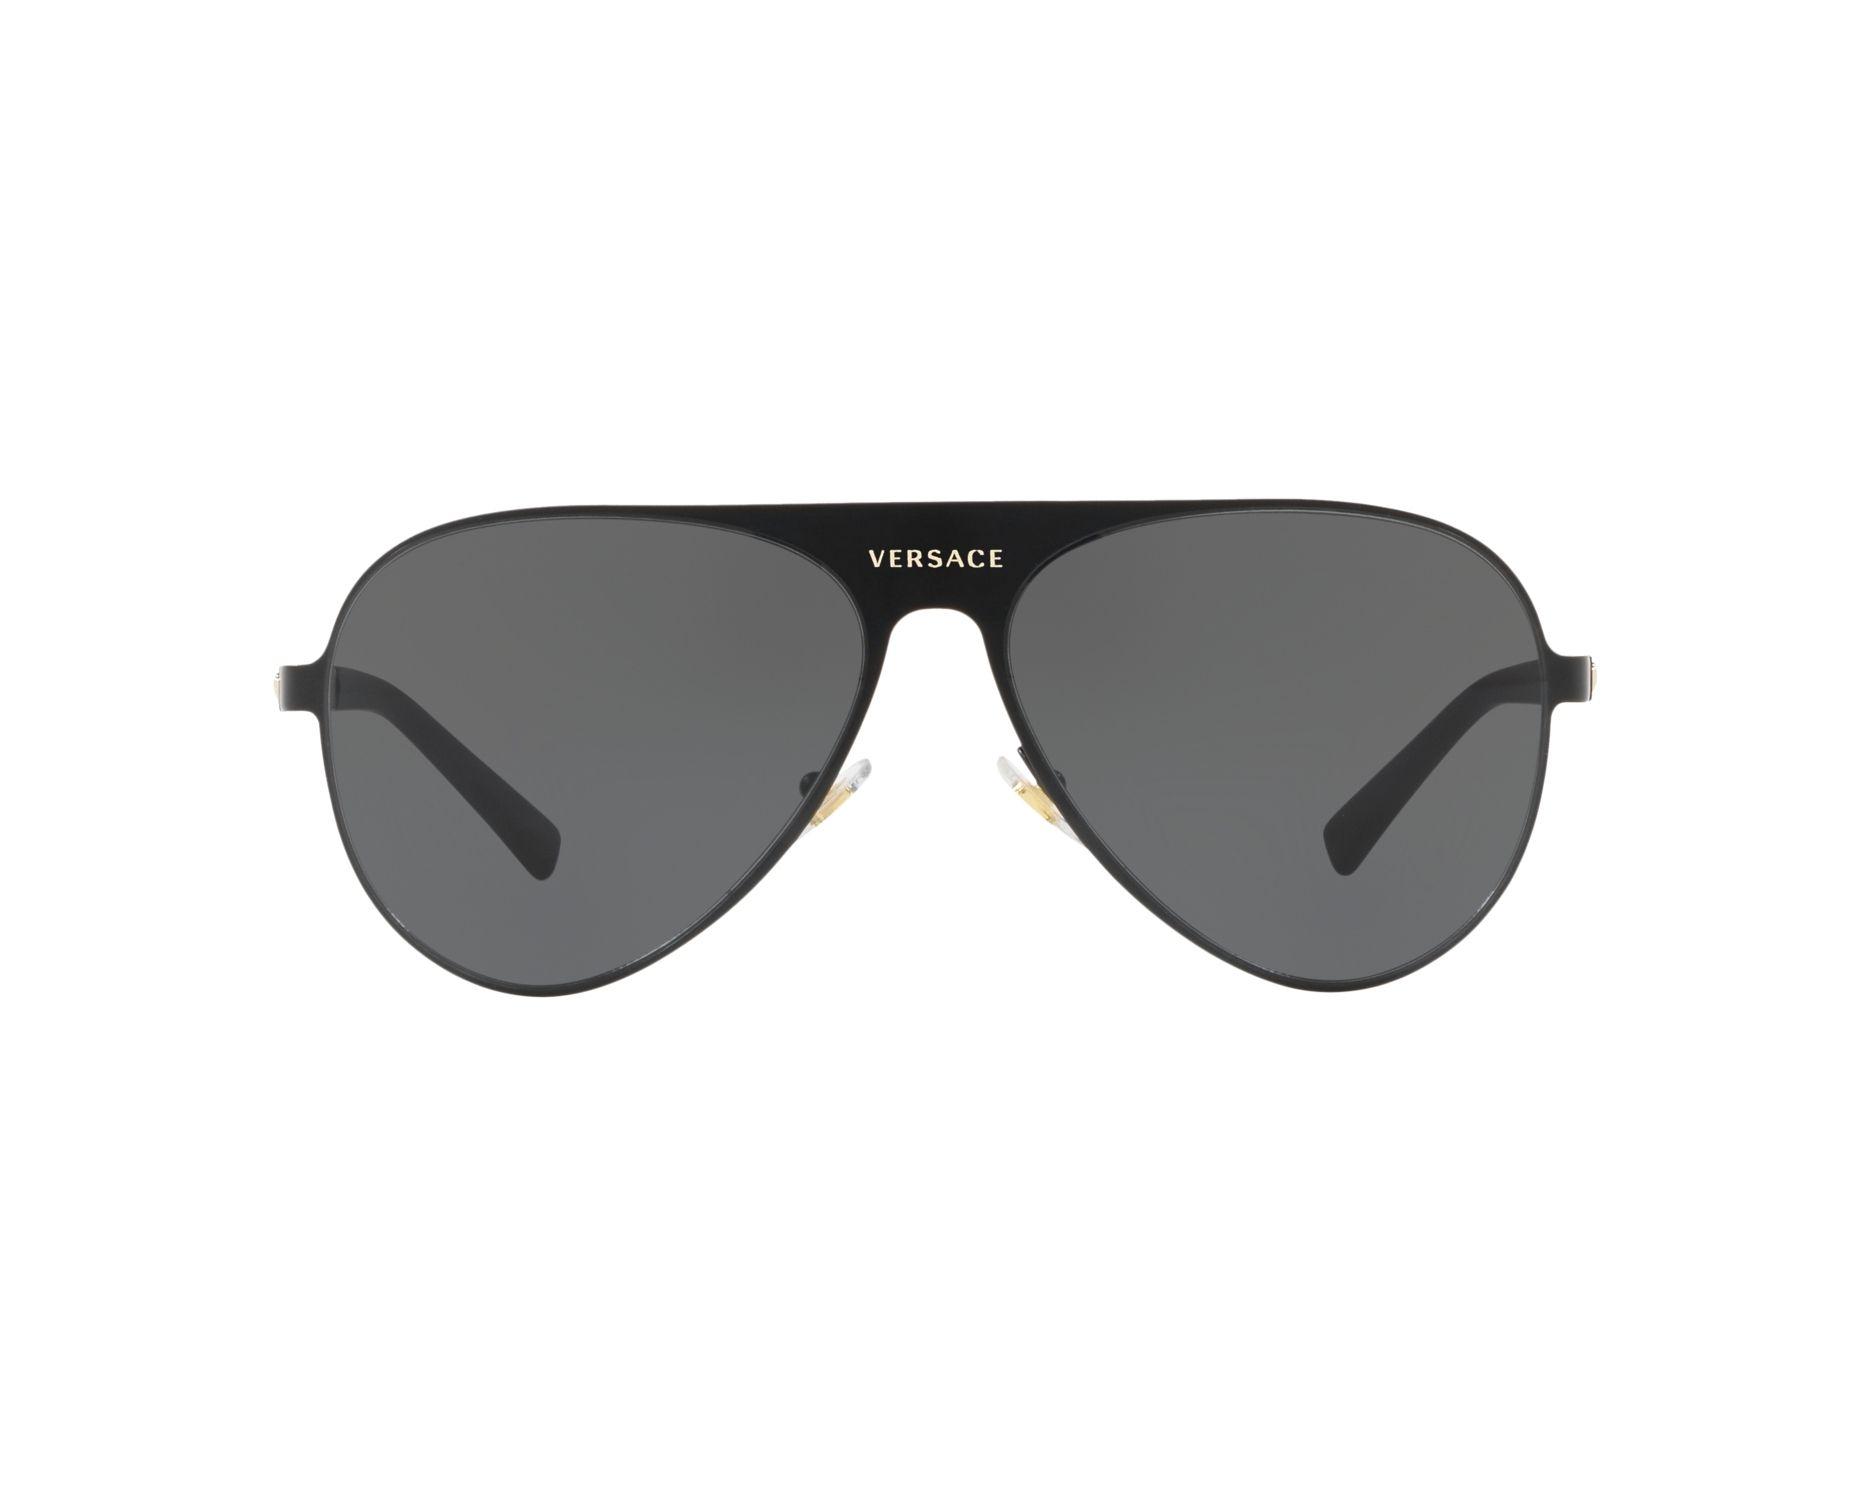 5df7c8ae379 Sunglasses Versace VE-2189 142587 59-14 Black Gold 360 degree view 1